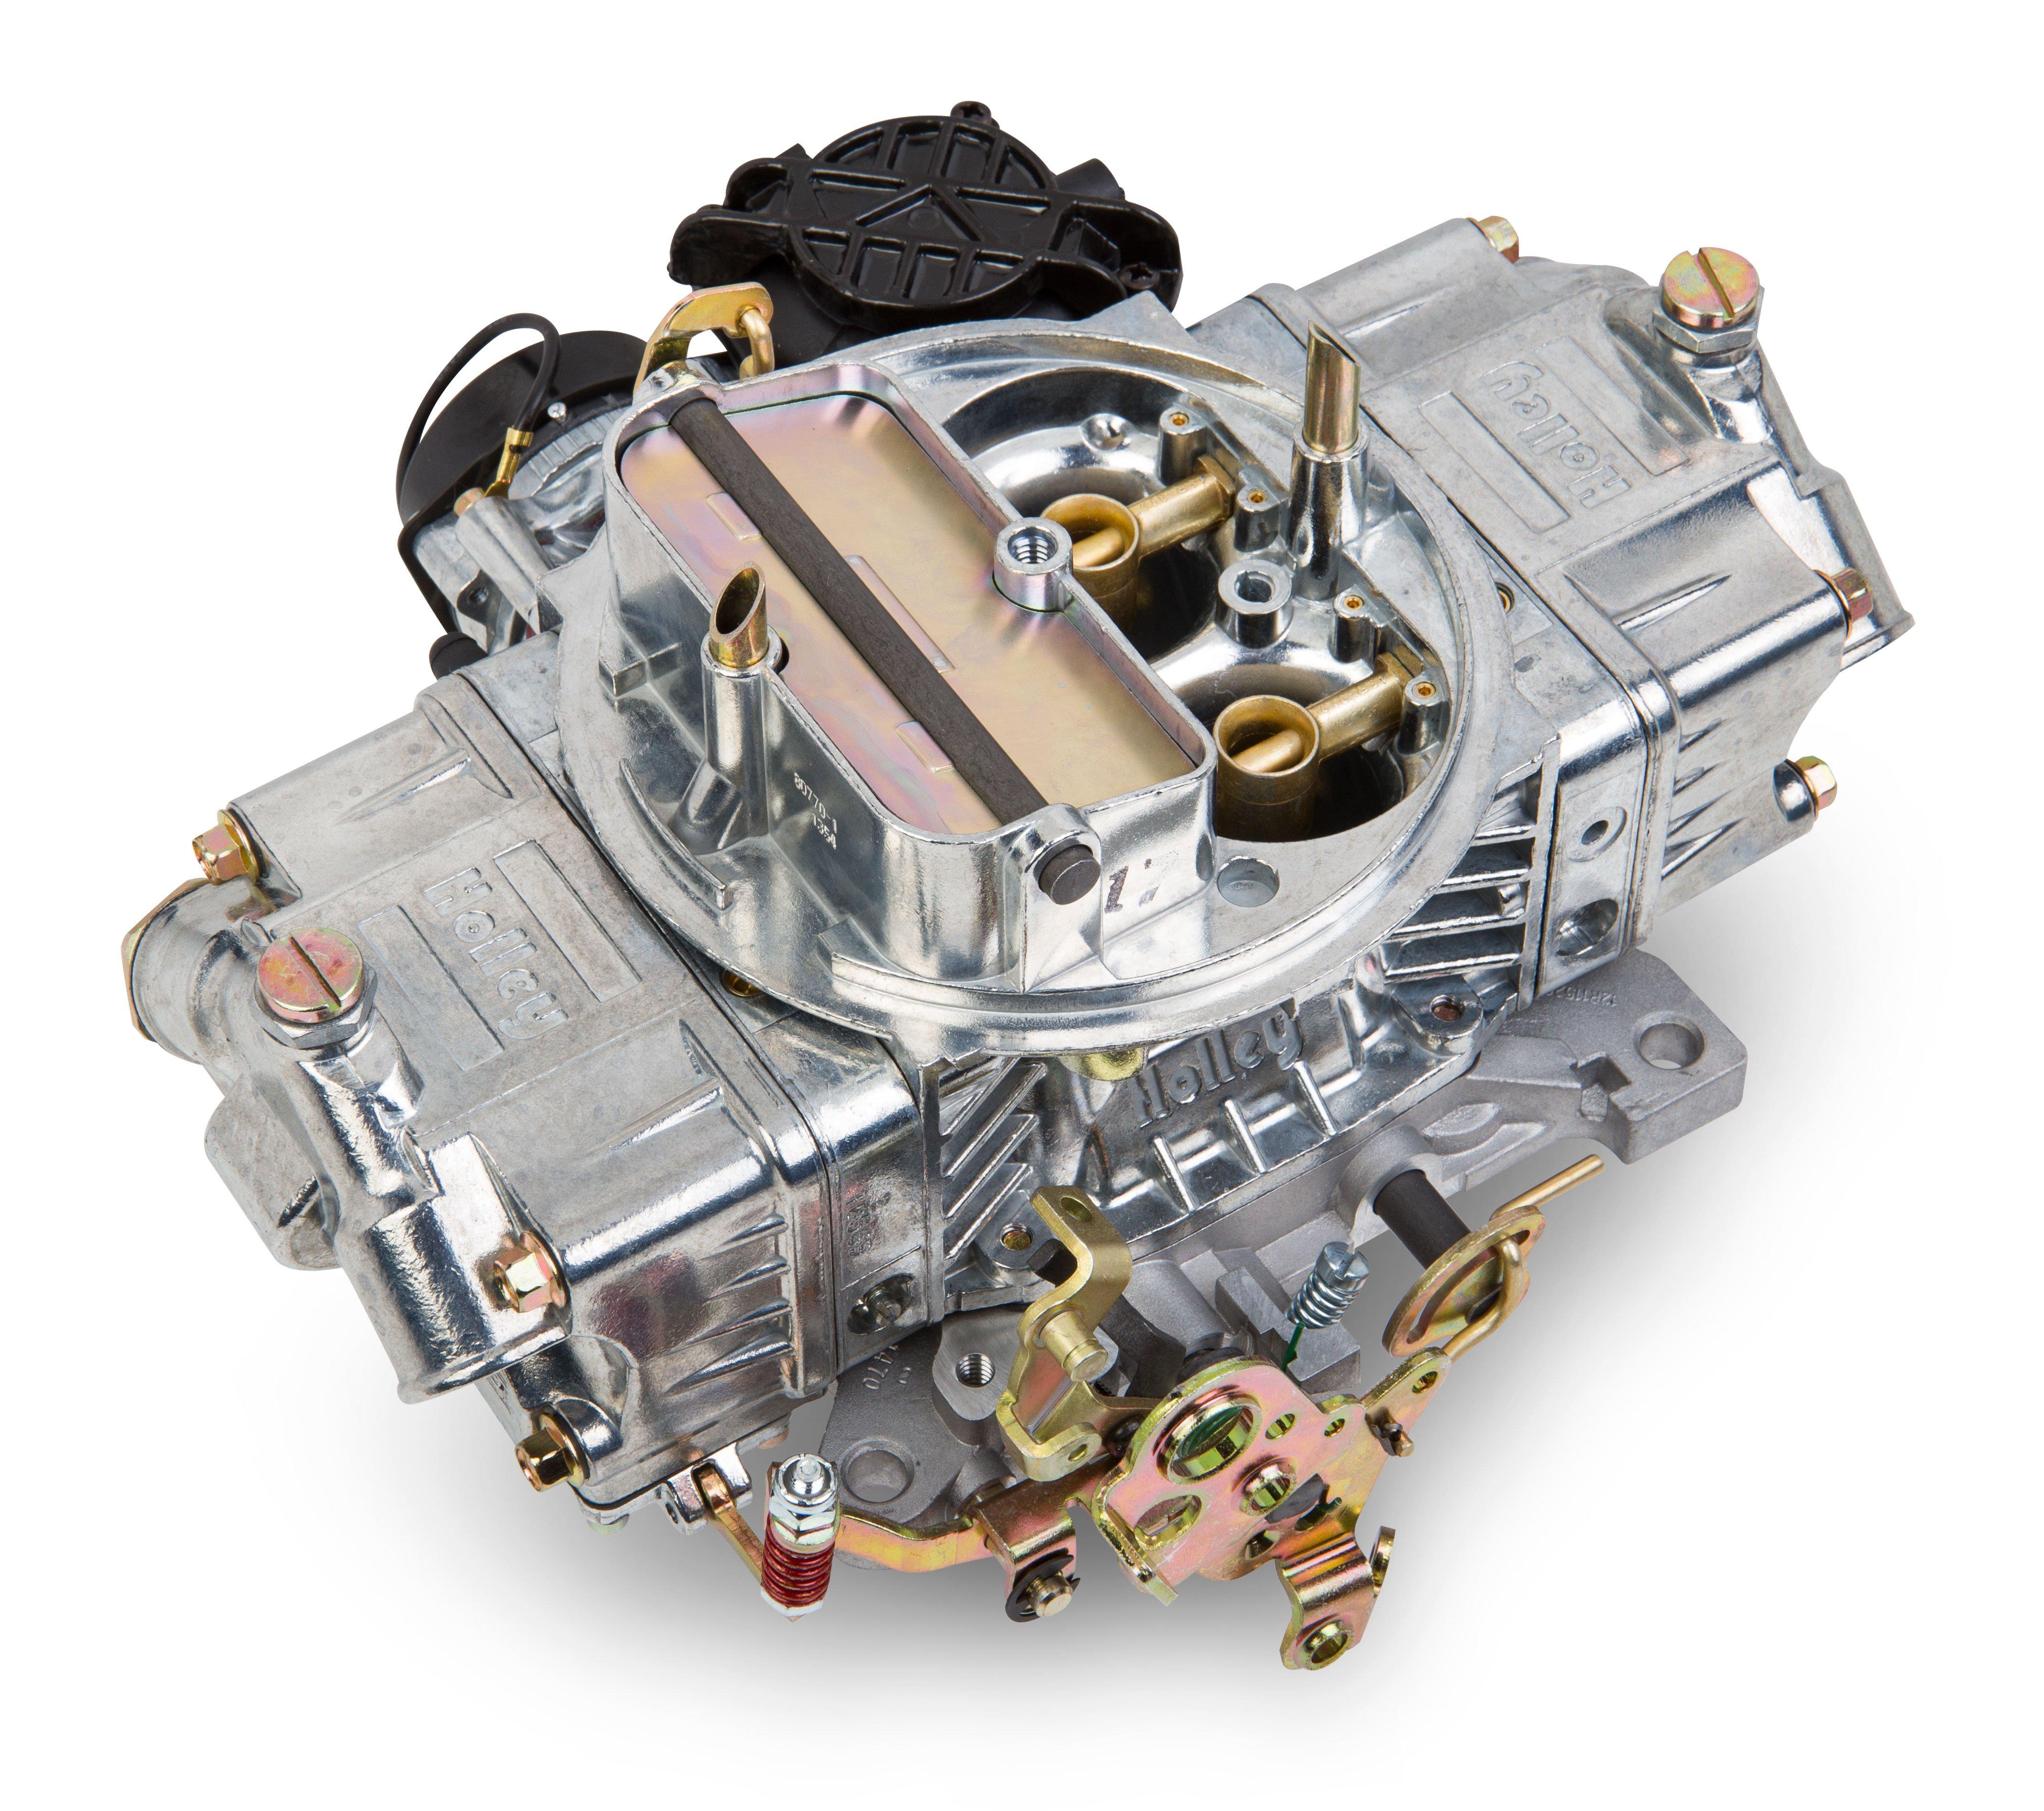 0-80770 - 770 CFM Street Avenger Carburetor Image